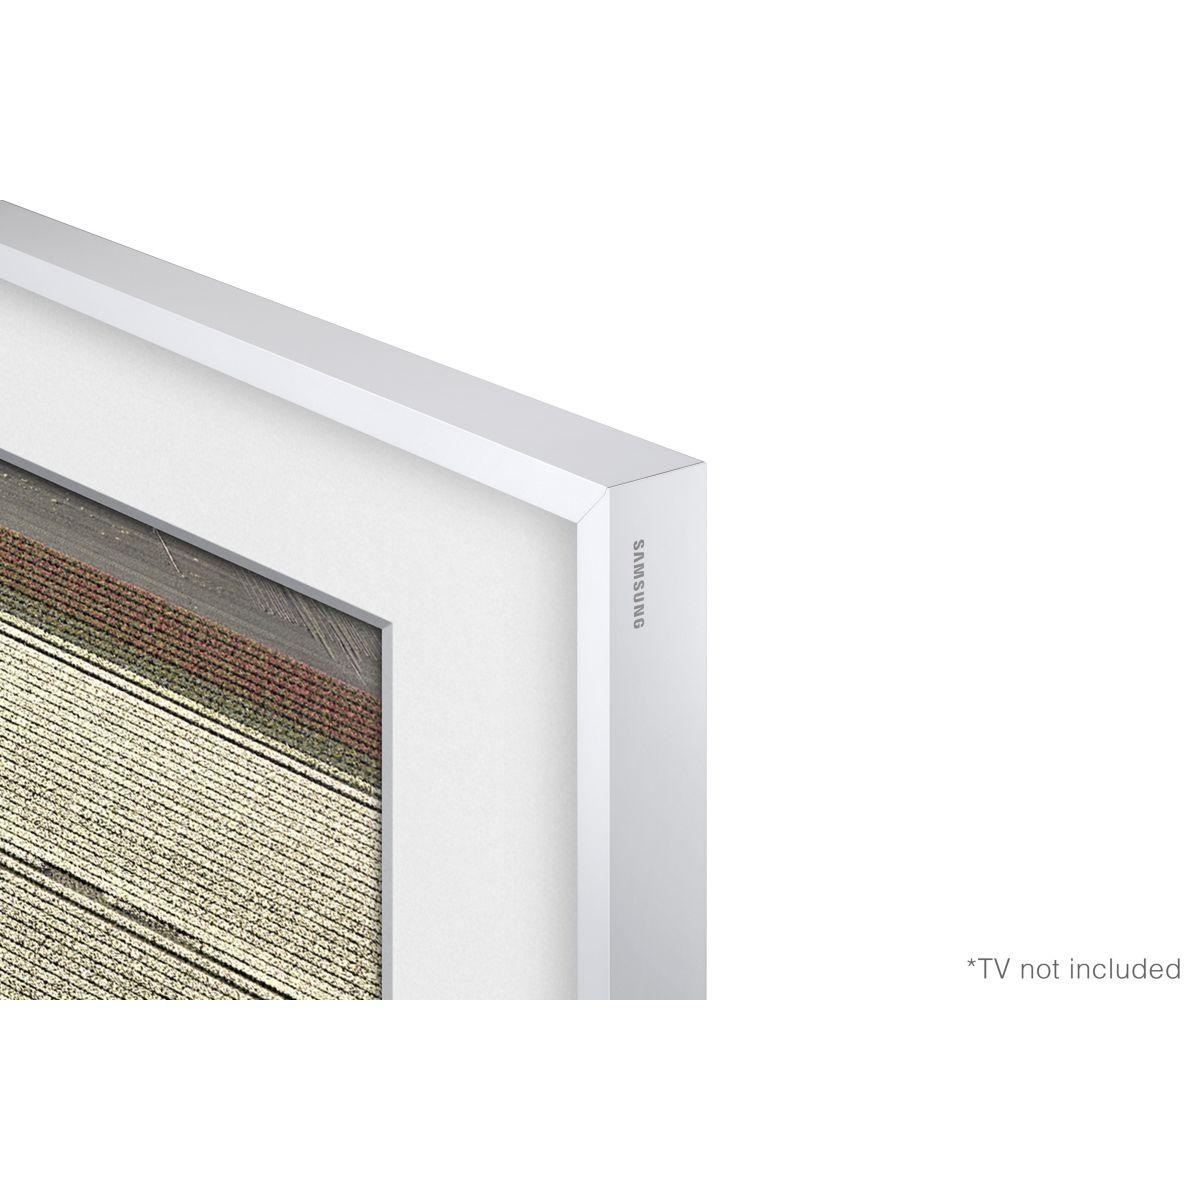 Cadre the frame samsung cadre vg-scfm55wm the frame white - 10% de remise imm�diate avec le code : fete10 (photo)